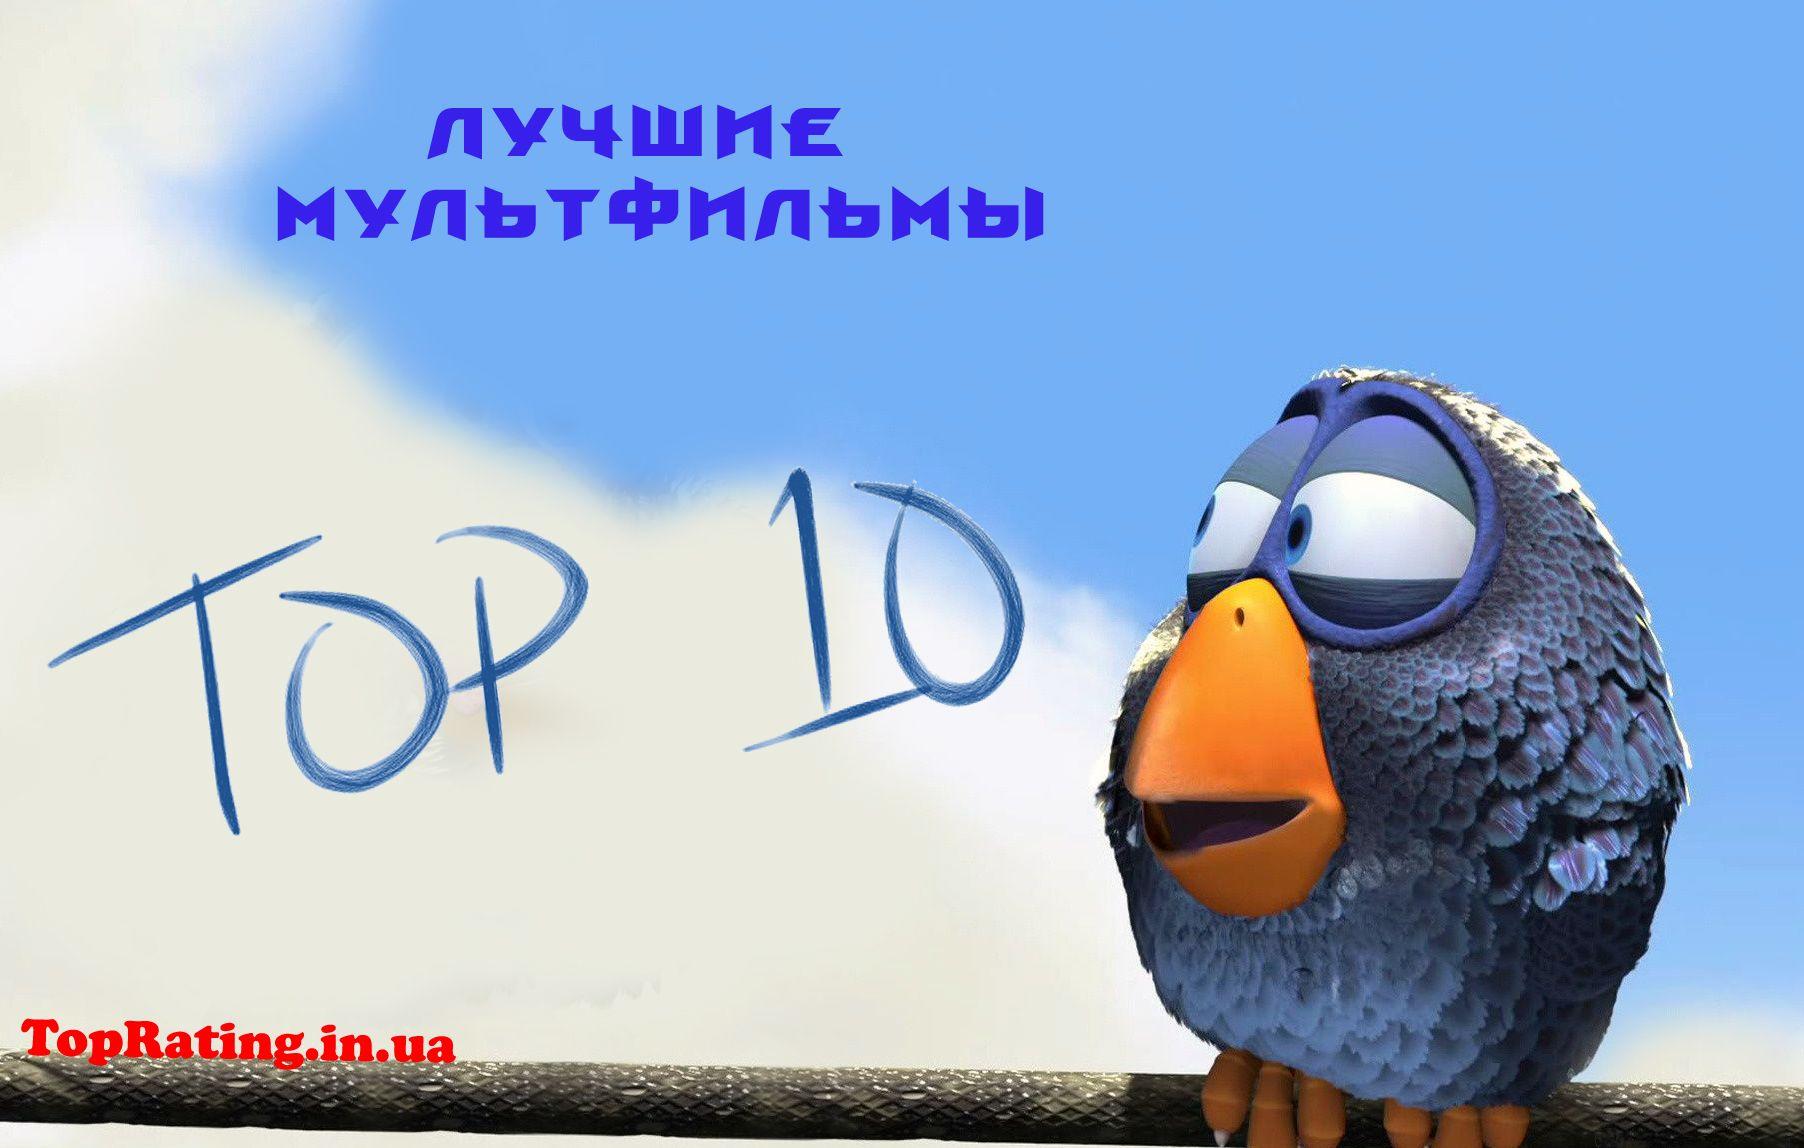 http://toprating.in.ua/wp-content/uploads/2014/12/top-10_rating_multfilmi.jpg